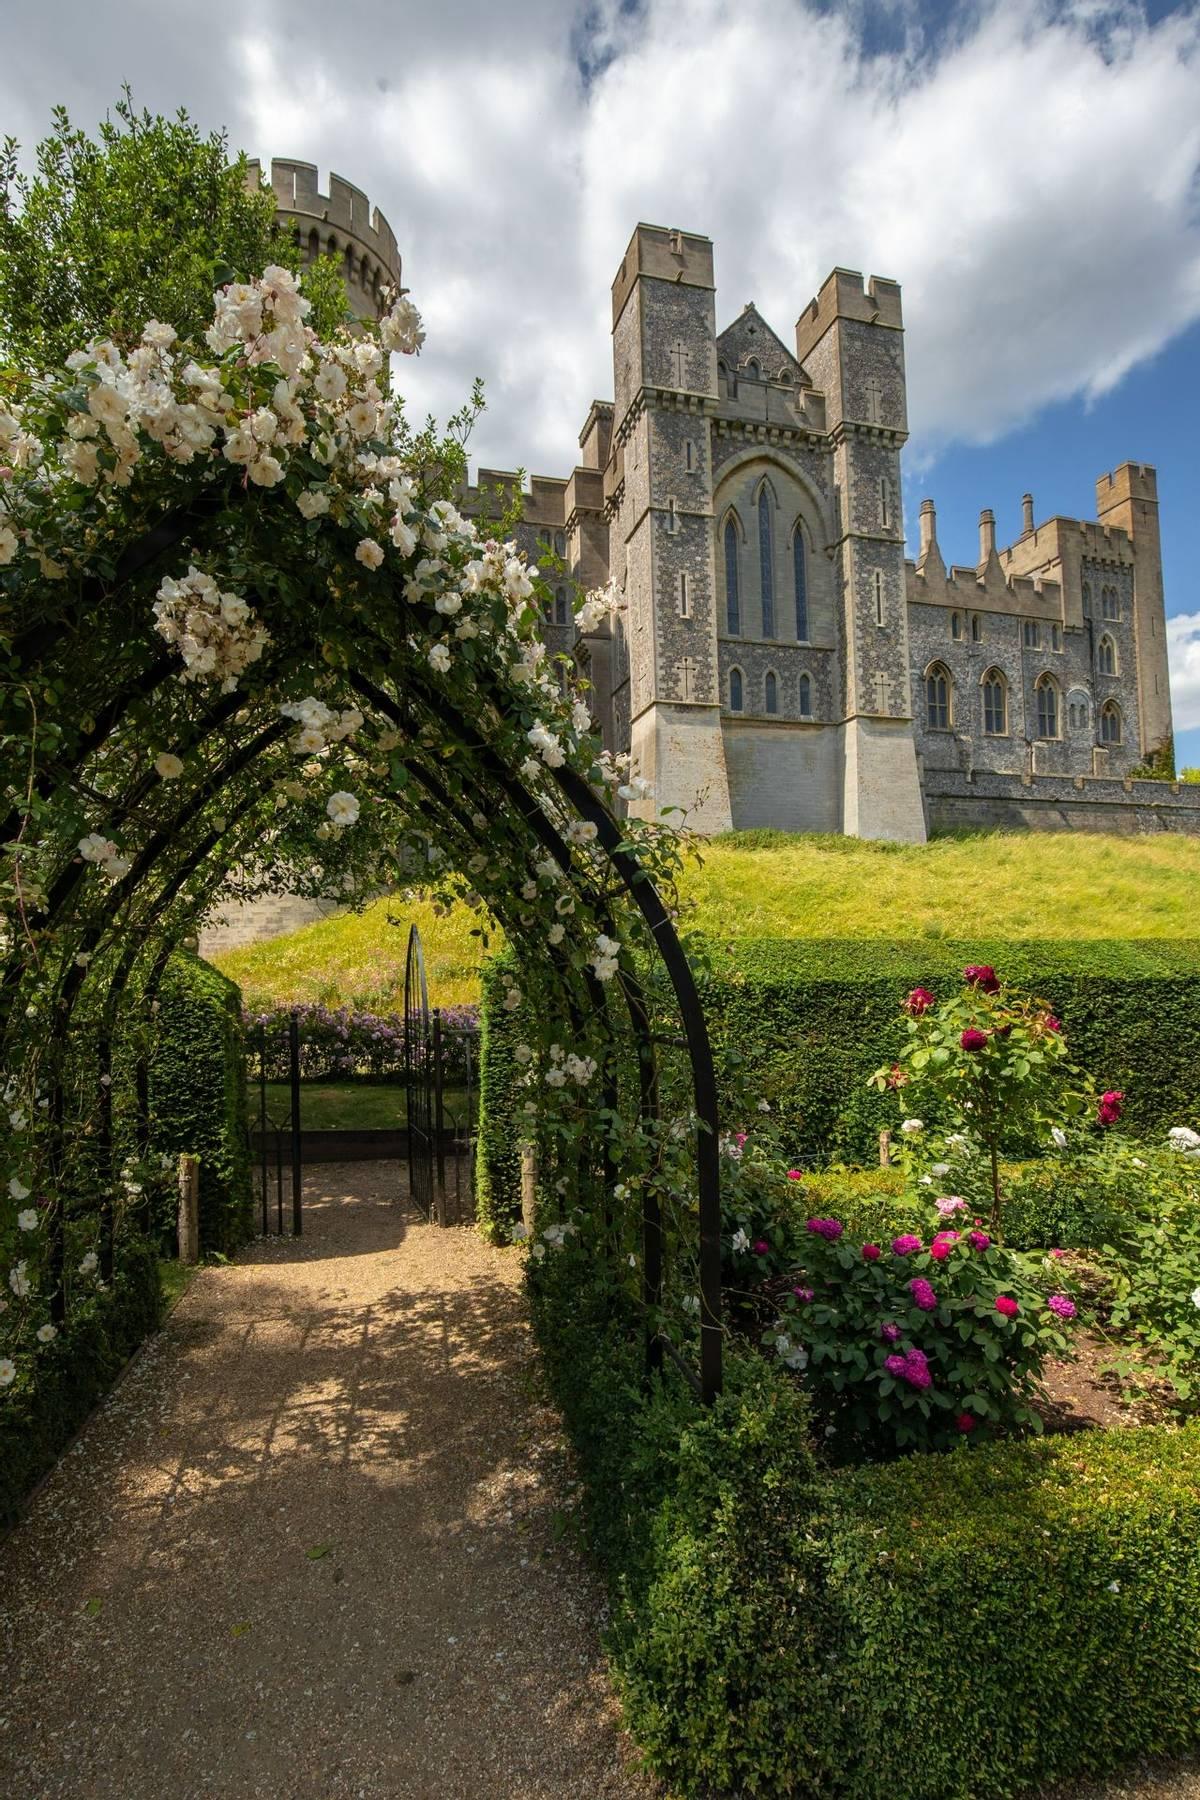 Abingworth - Walking with Sightseeing - Arundel Castle - AdobeStock_225051768.jpeg